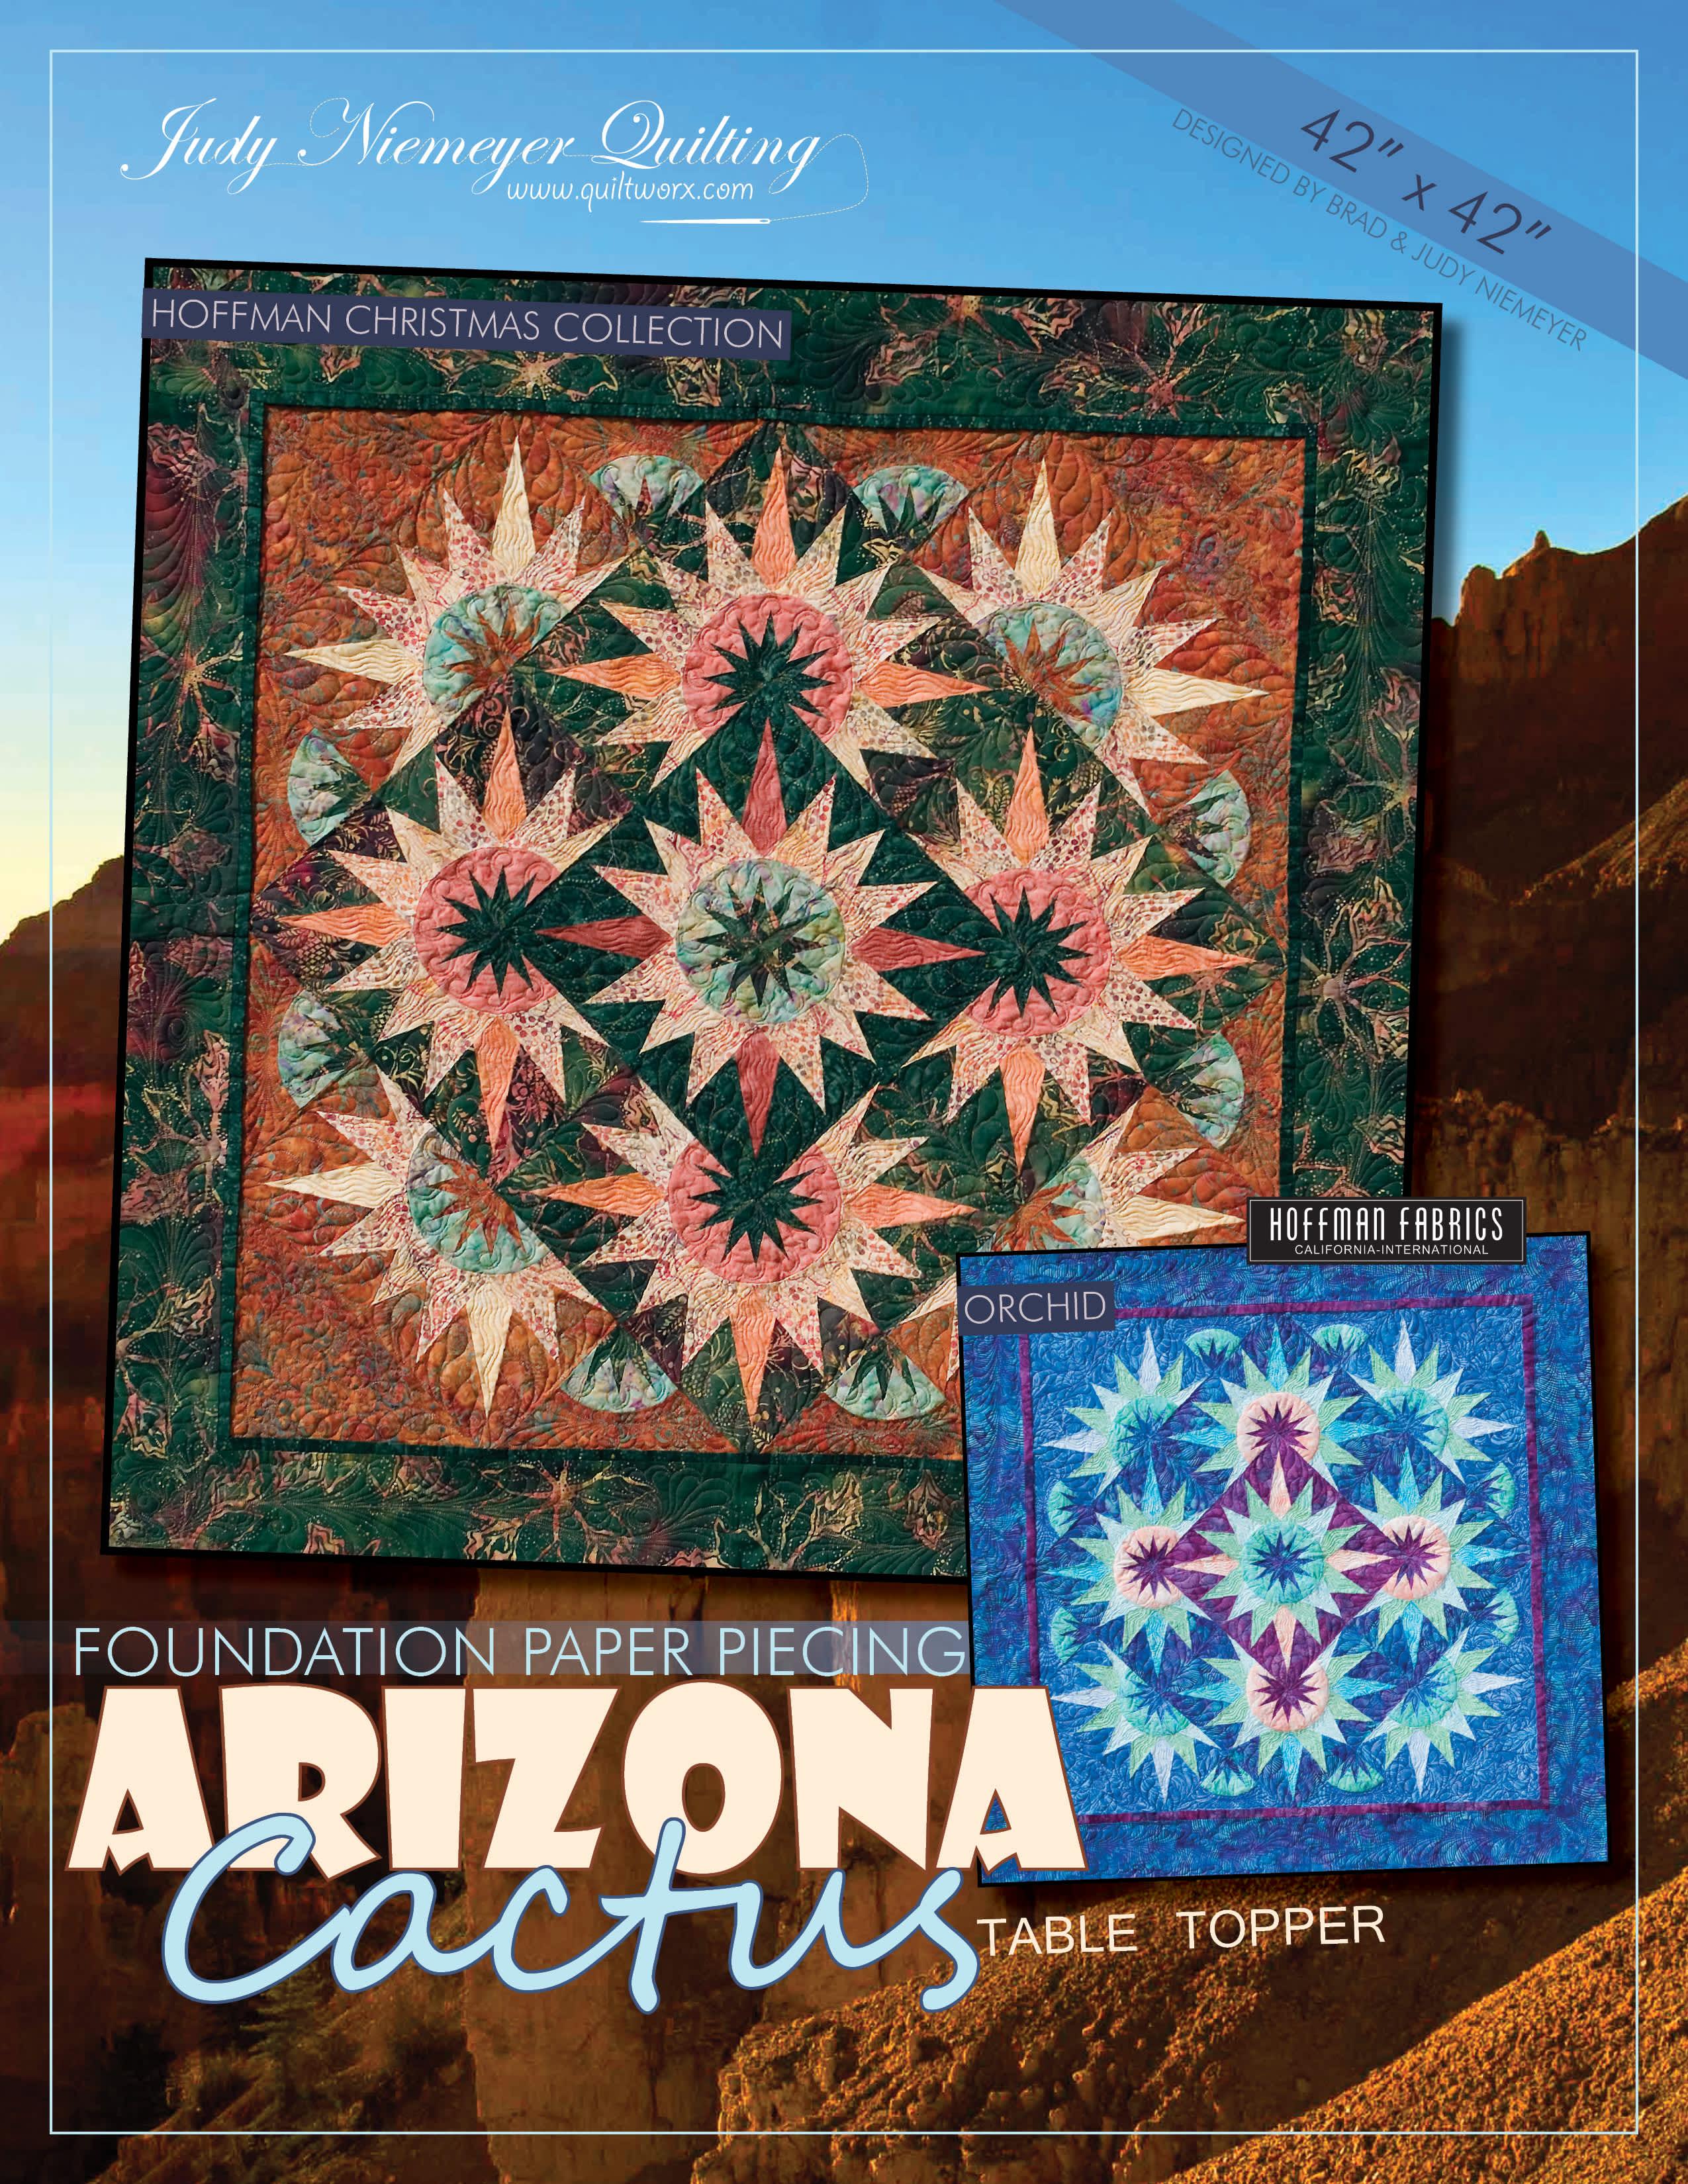 Arizona Cactus (2012)